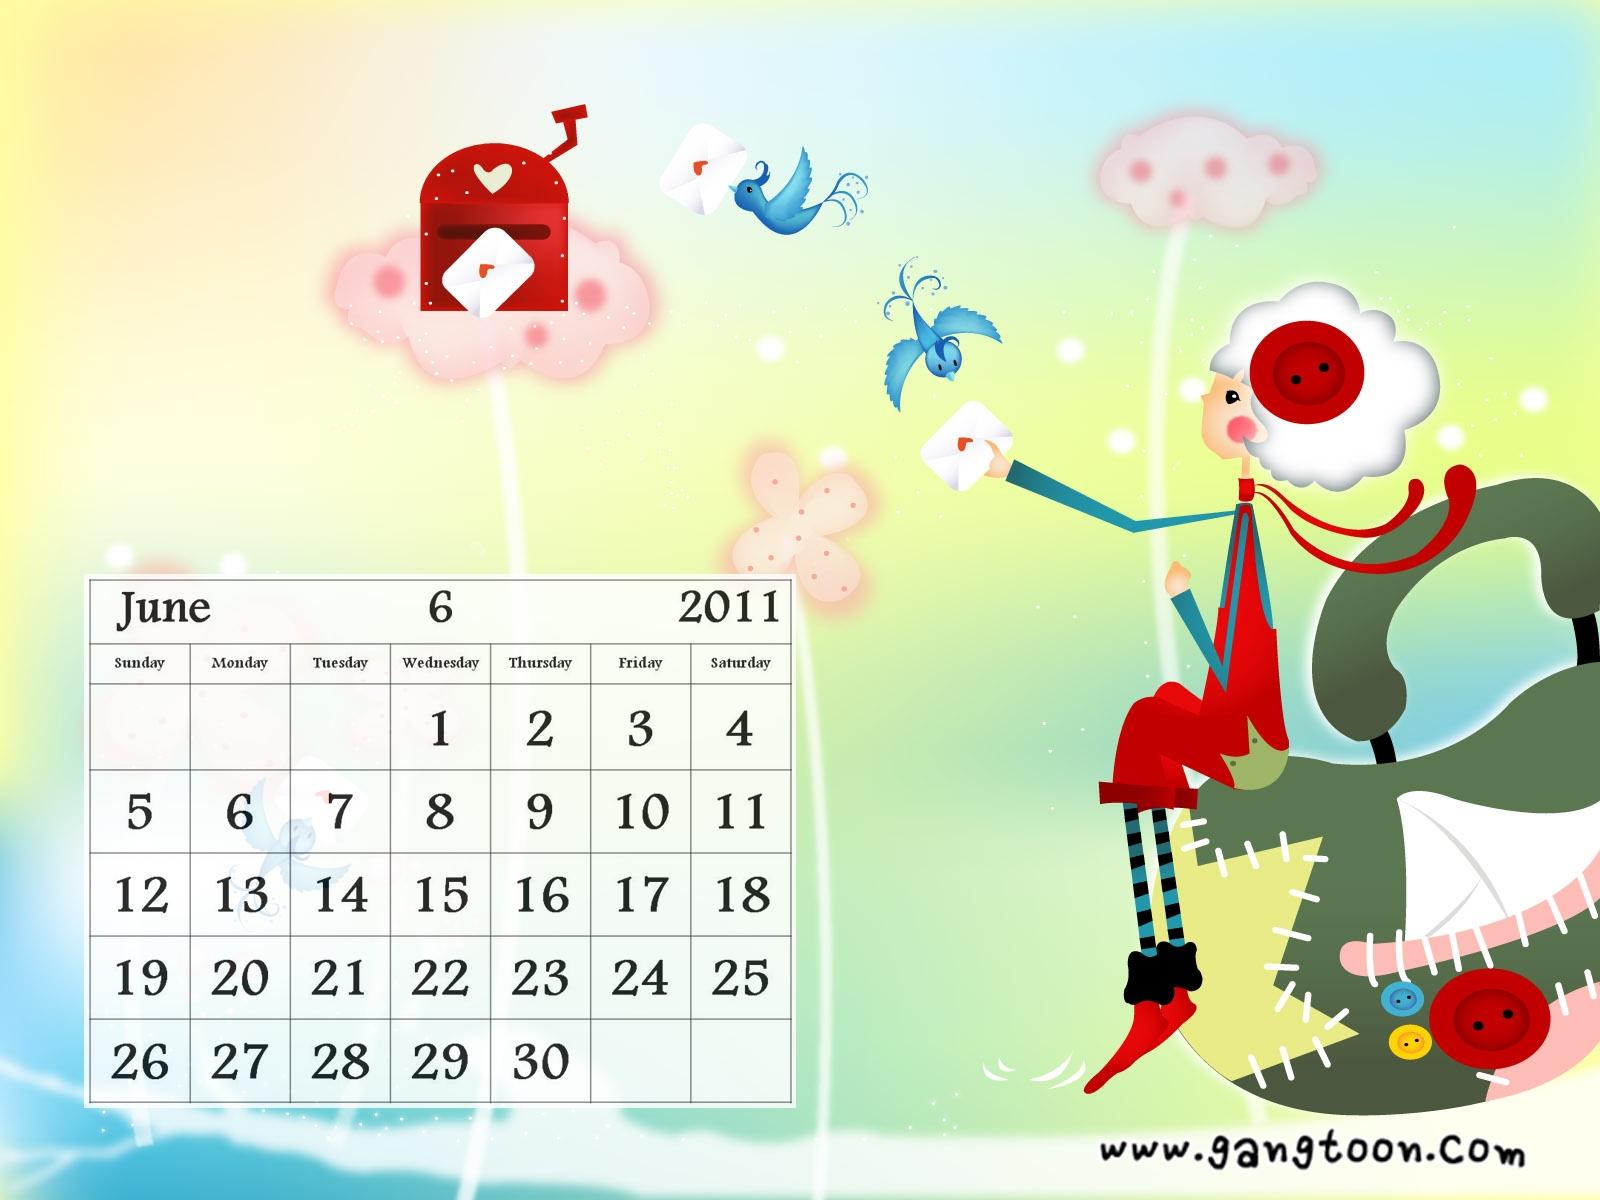 http://4.bp.blogspot.com/-bTx3jSCZ2dA/TgKu4XglHHI/AAAAAAAABlQ/quZiFZNMPLE/s1600/122611462842368.jpg